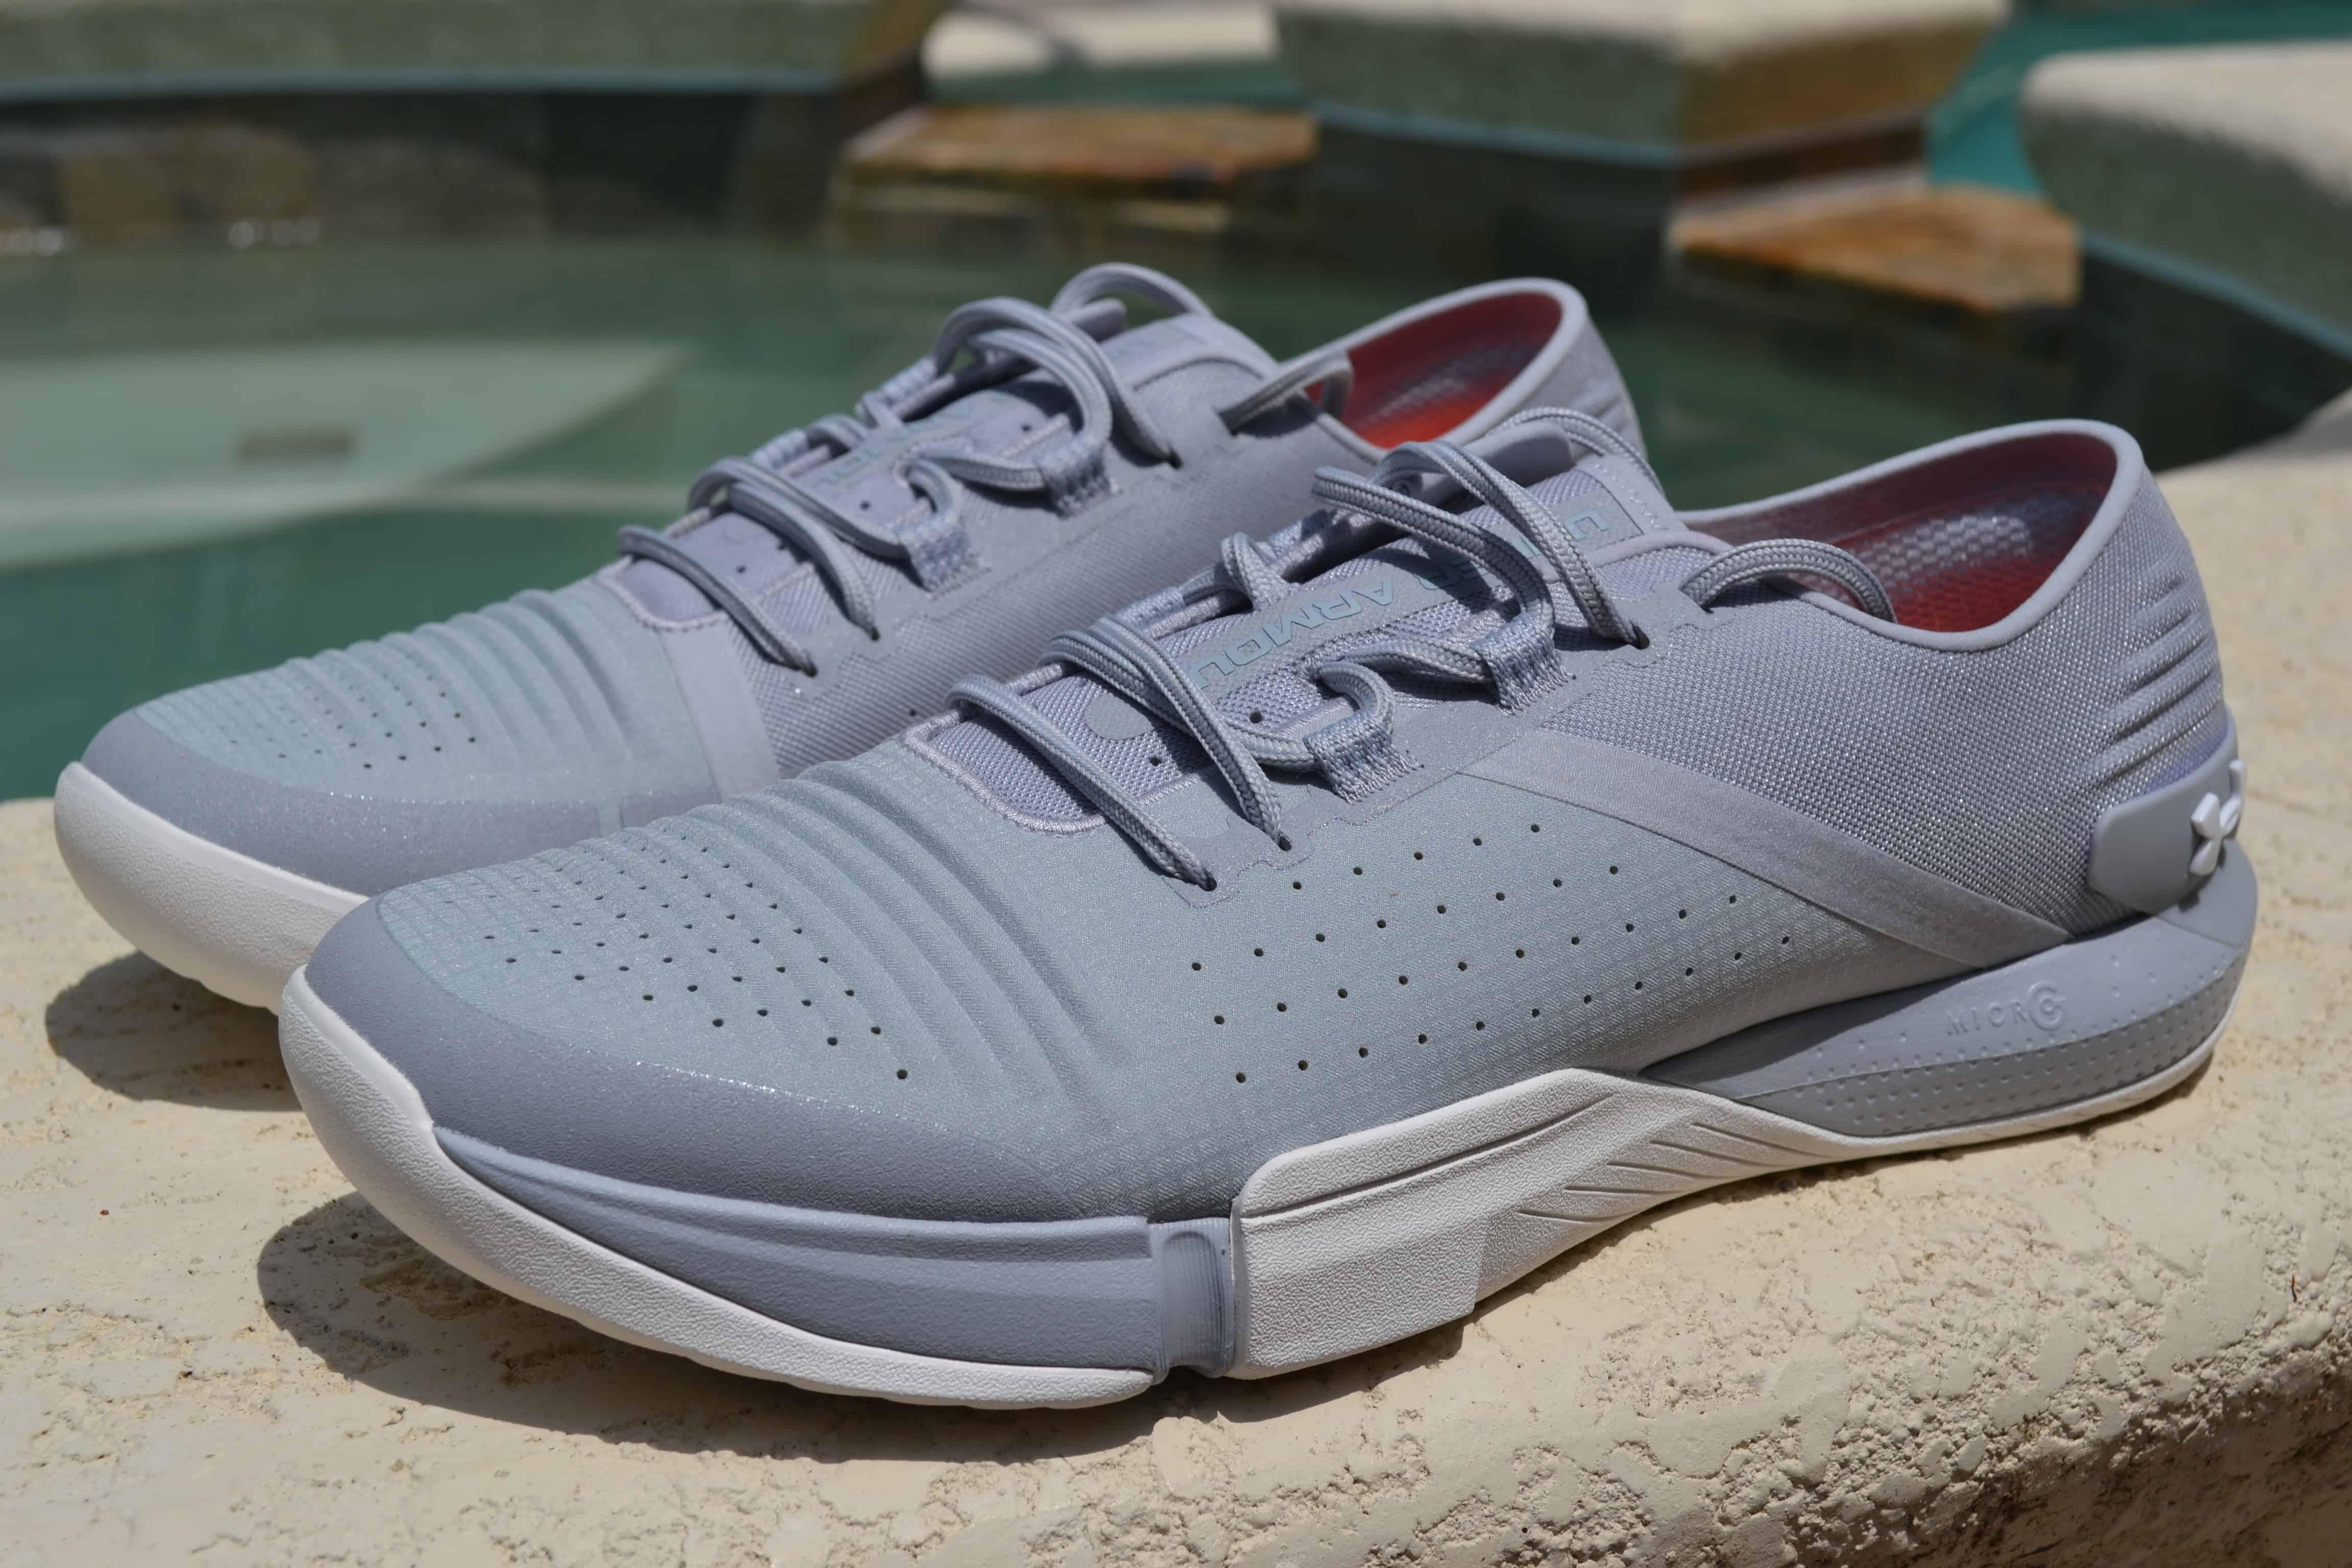 Under Armour TriBase Reign Training Shoe